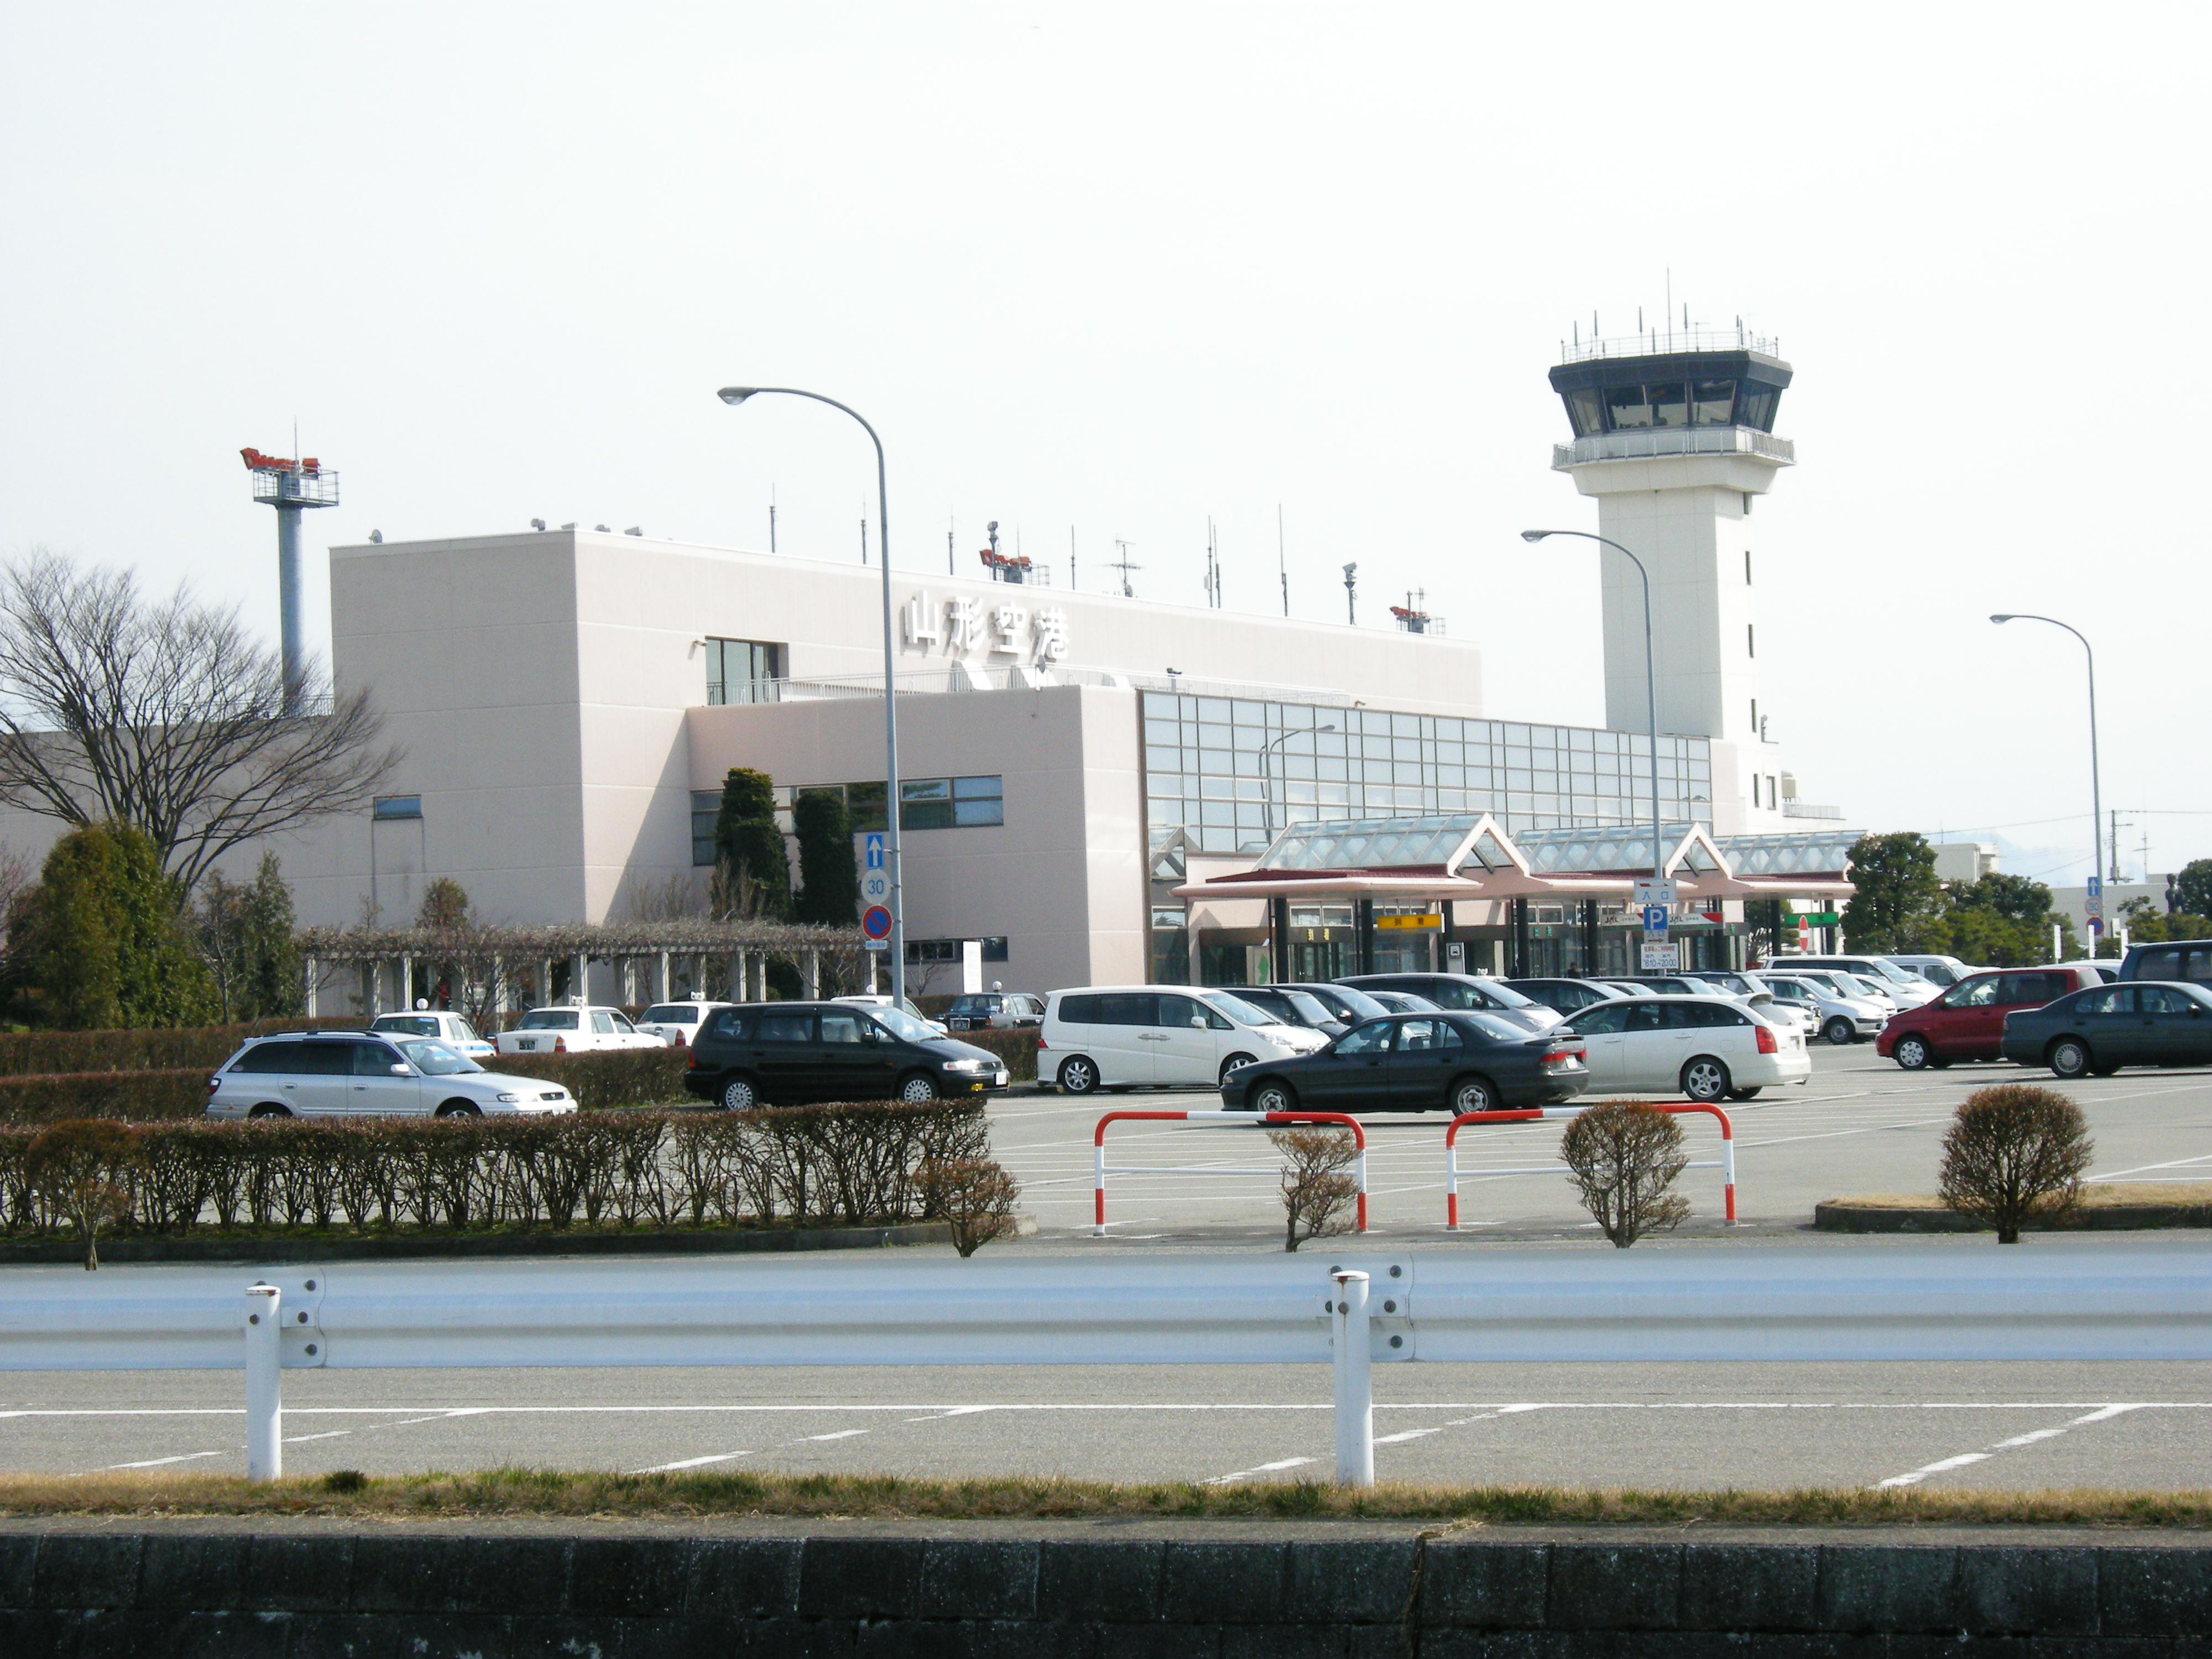 فرودگاه یاماگاتا